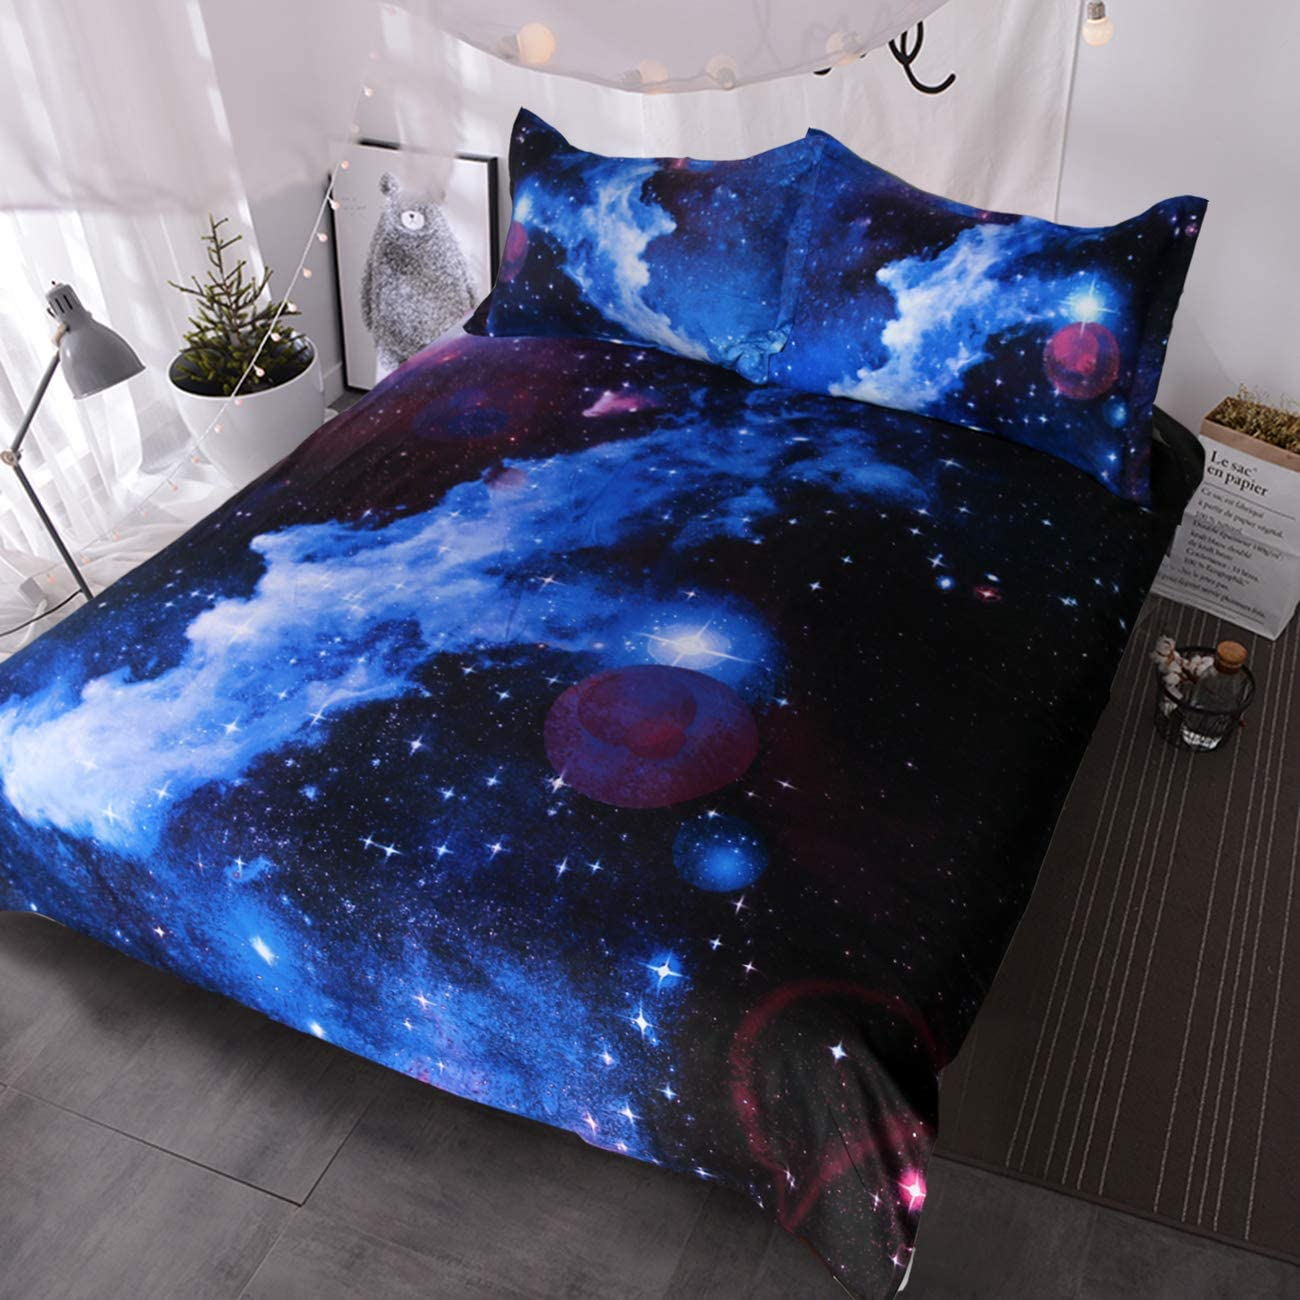 Blessliving Online limited product Blue and Purple Nebula Bedding C 25% OFF Galaxy 3D Set Duvet